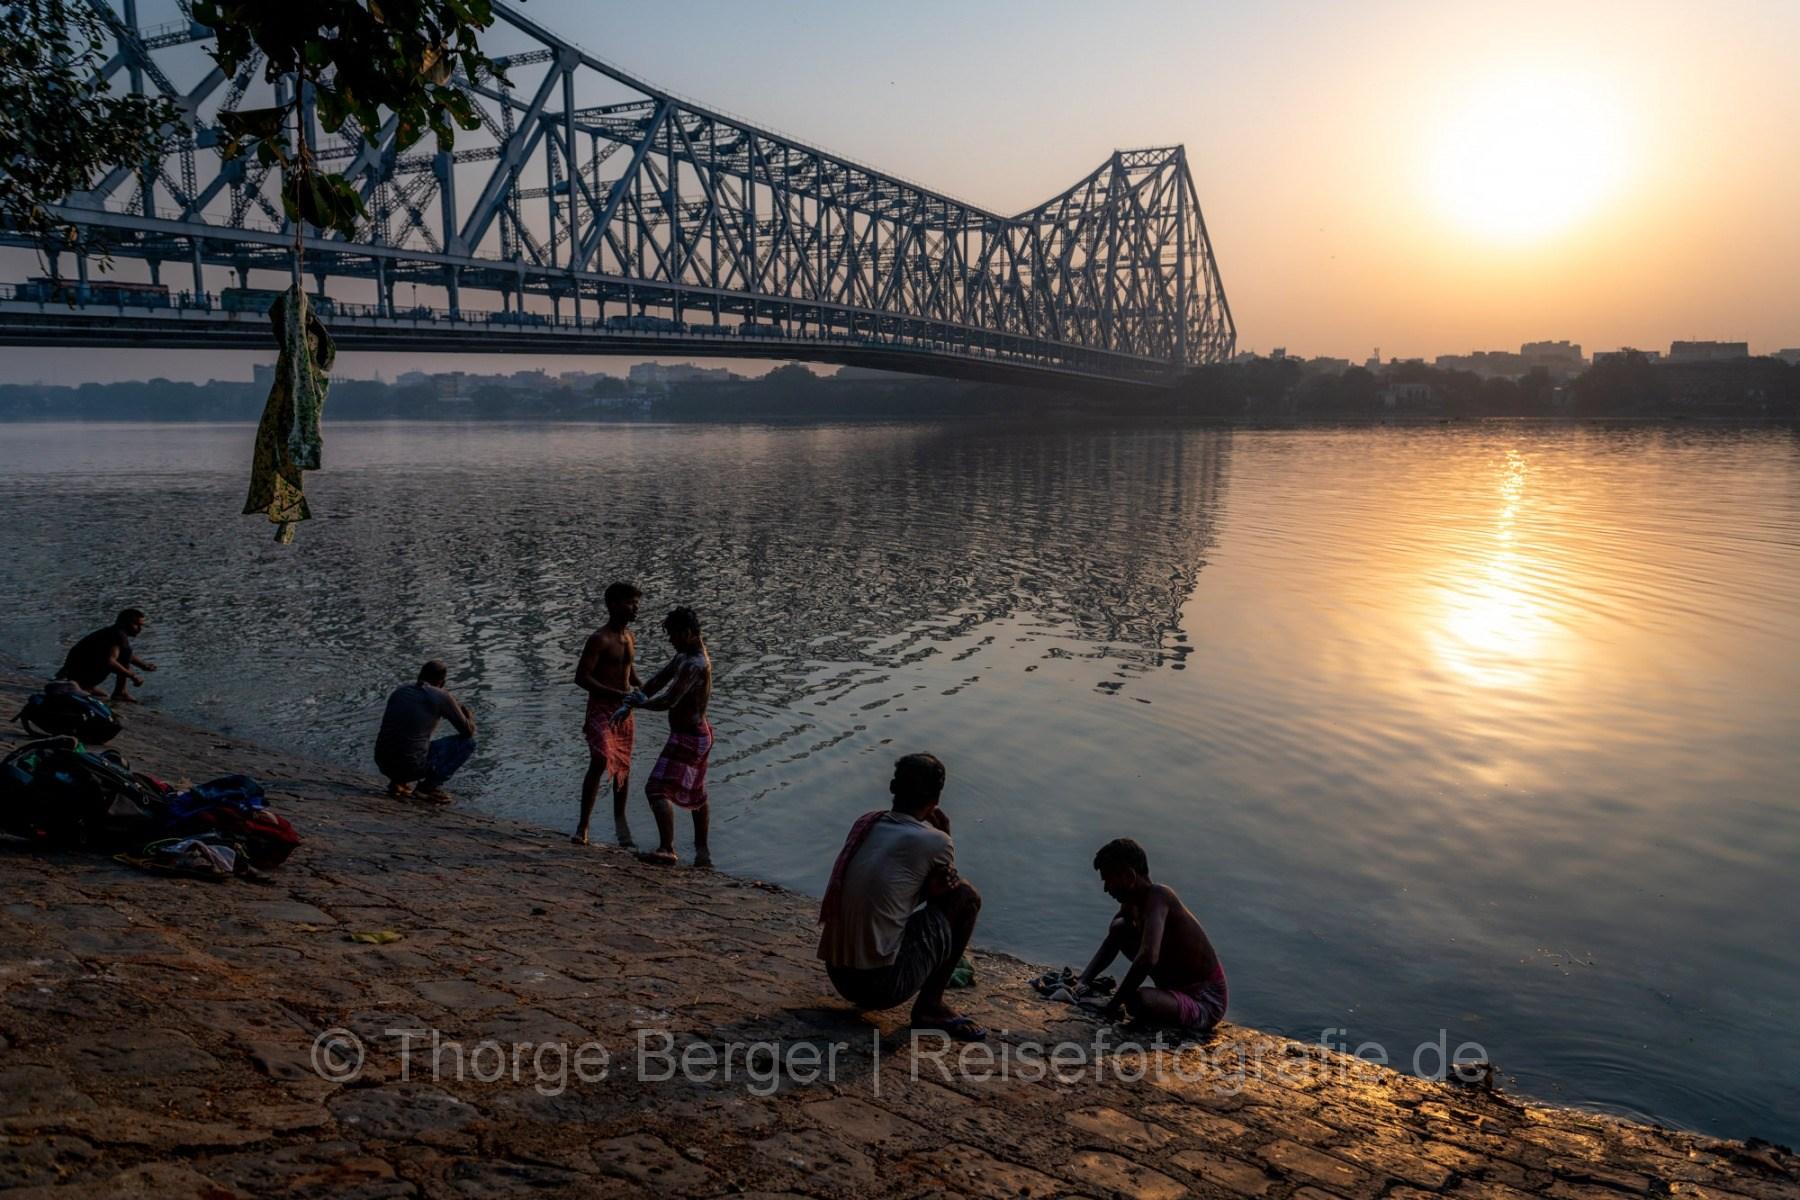 Sunrise in Kolkata